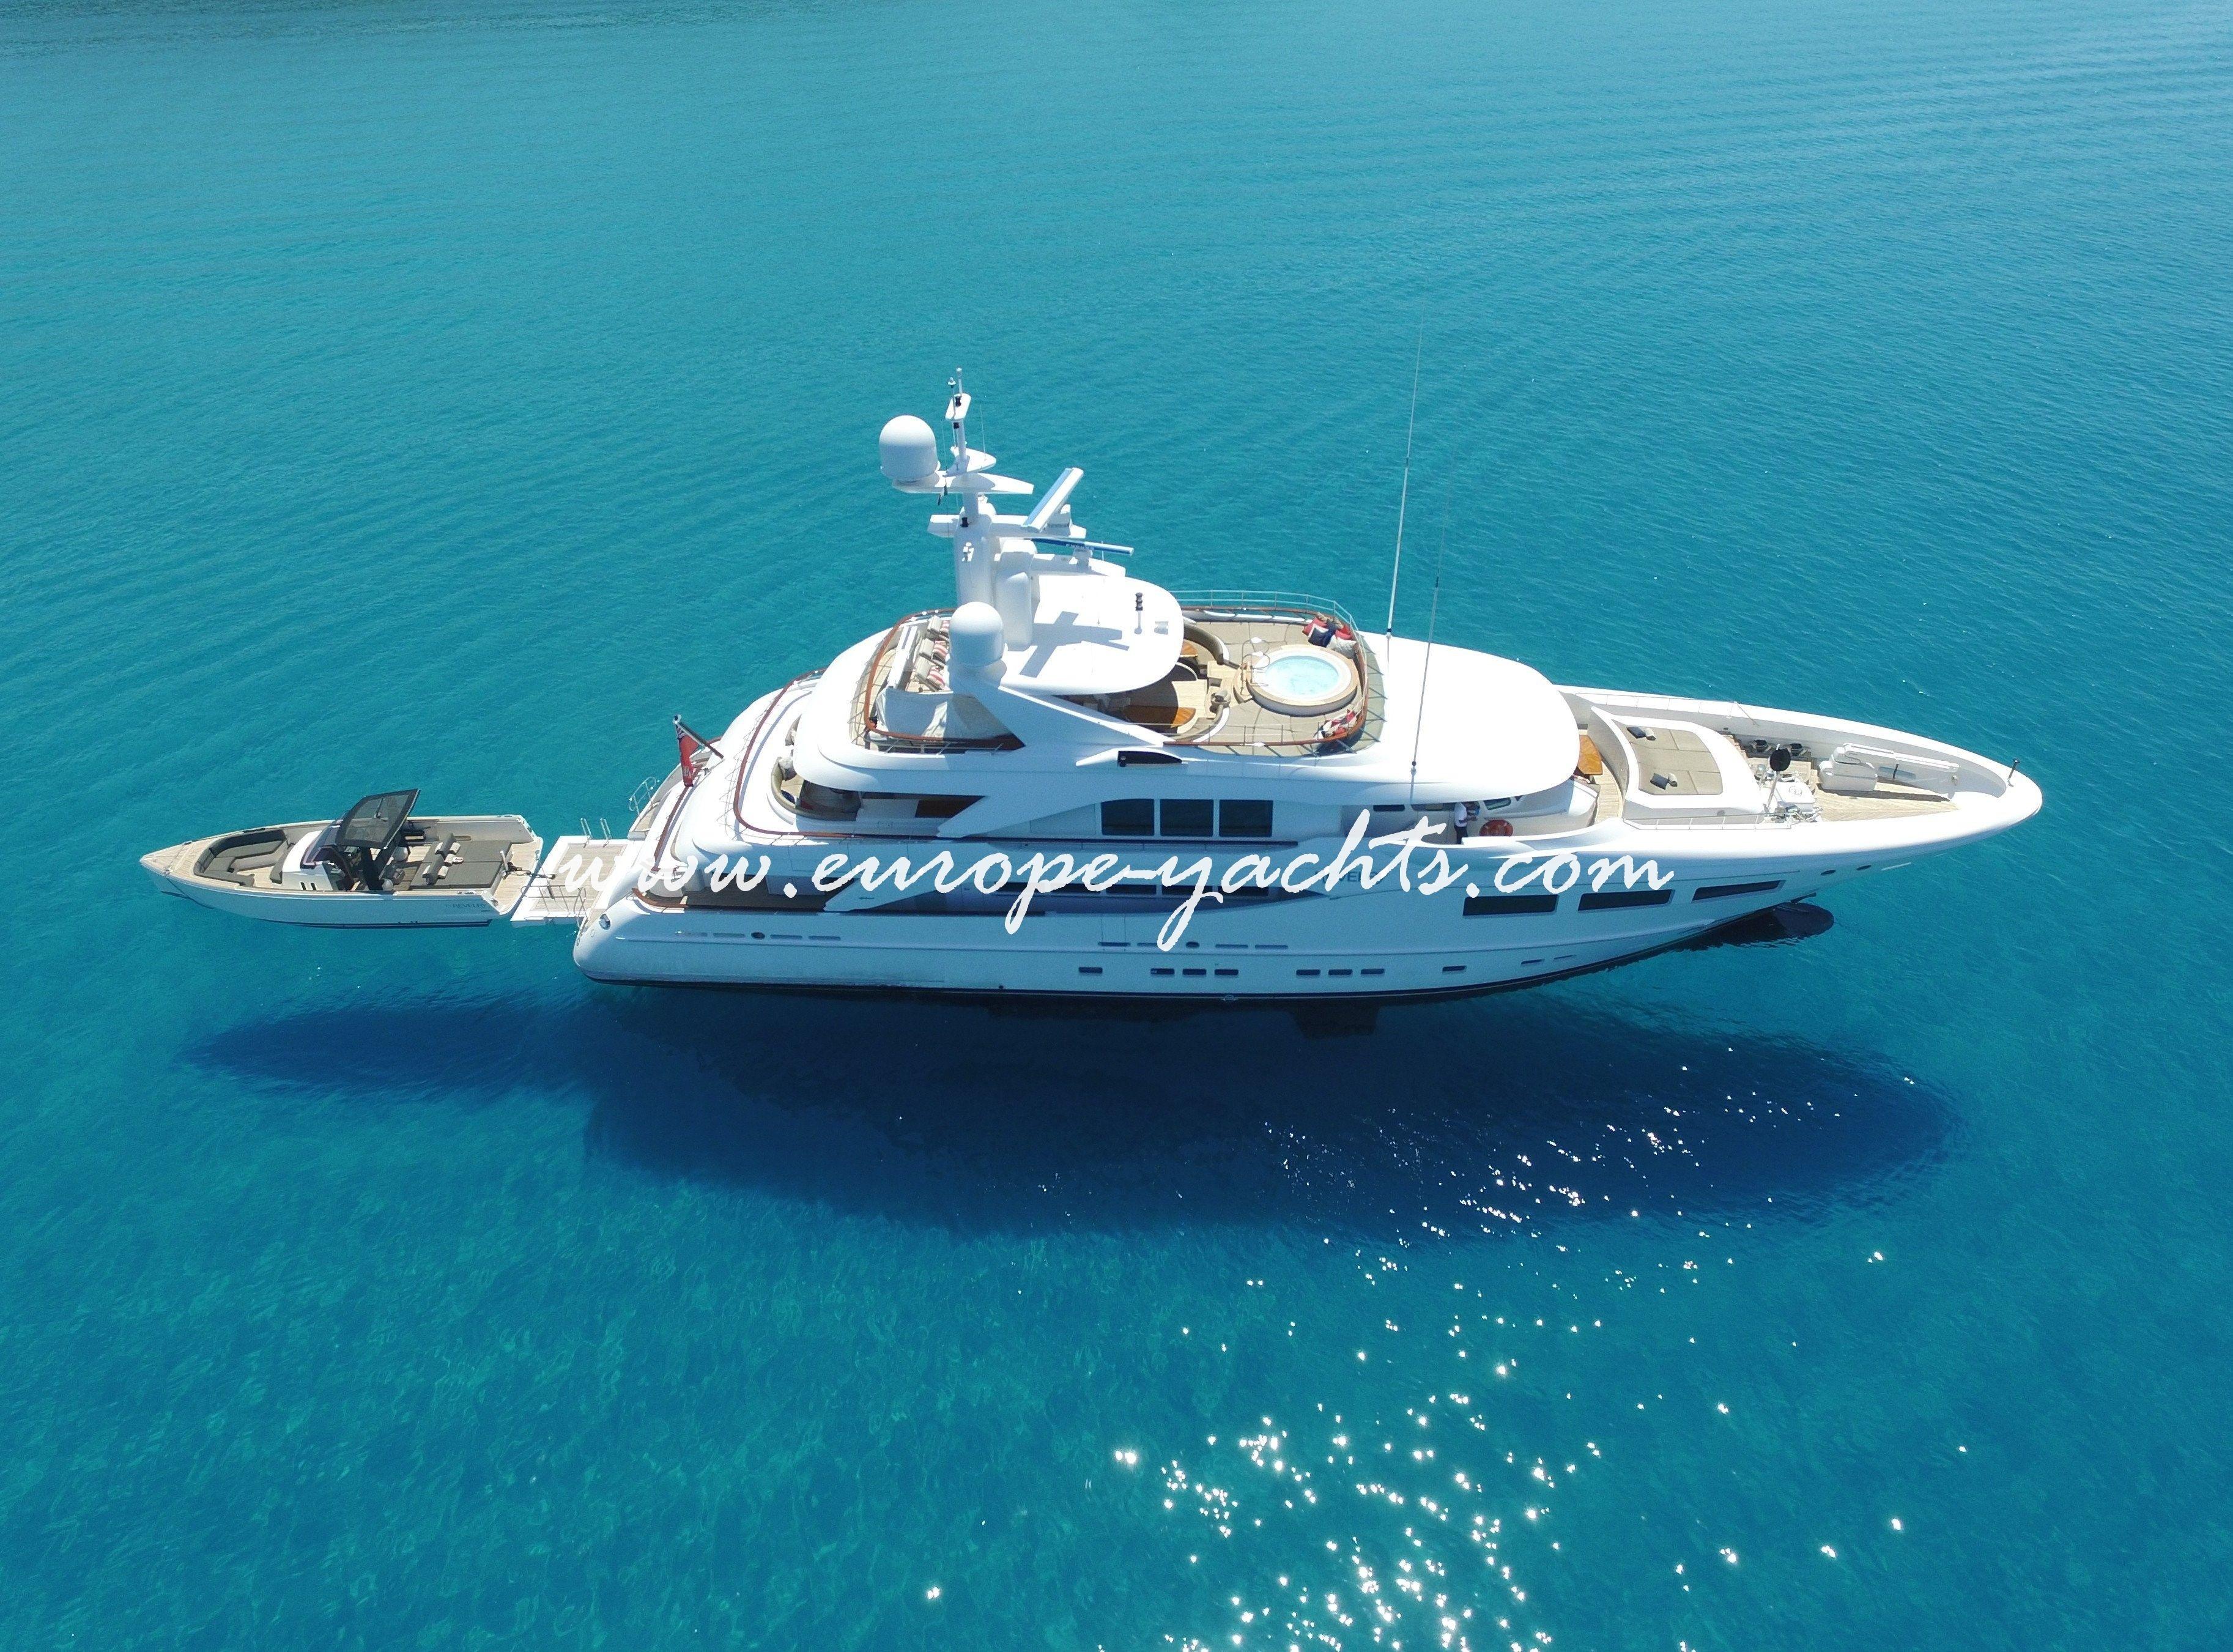 Revelry luxury yacht charter Croatia with Europe Yachts Charter